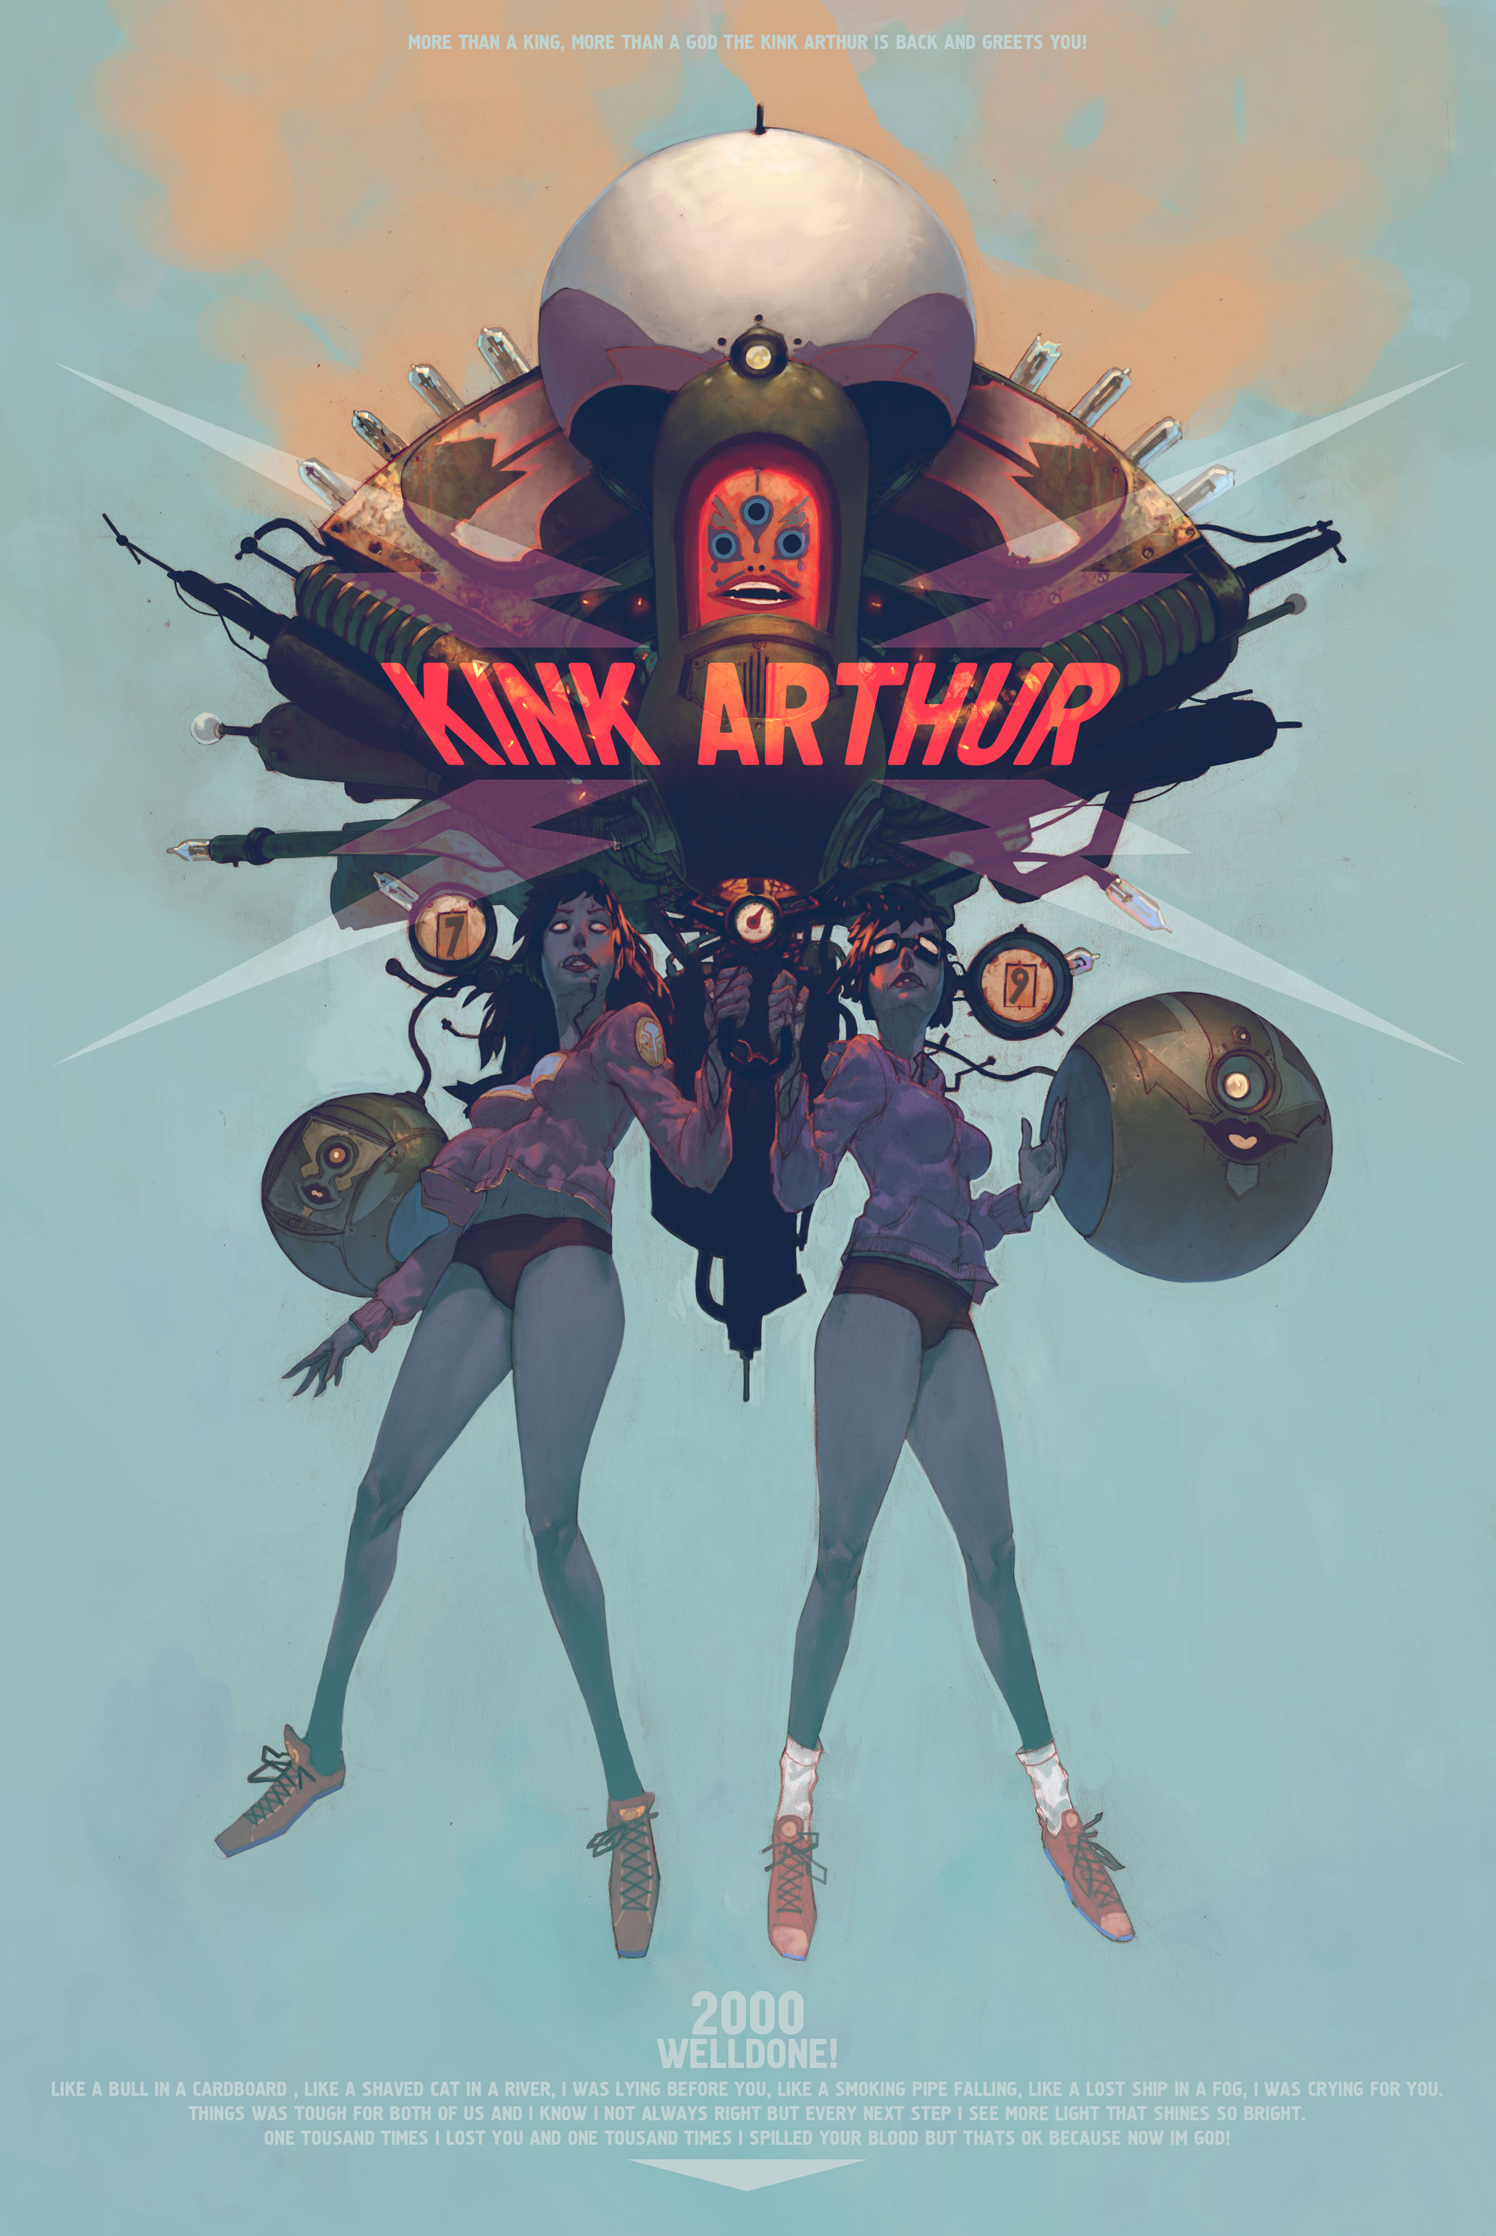 Kink Arthur